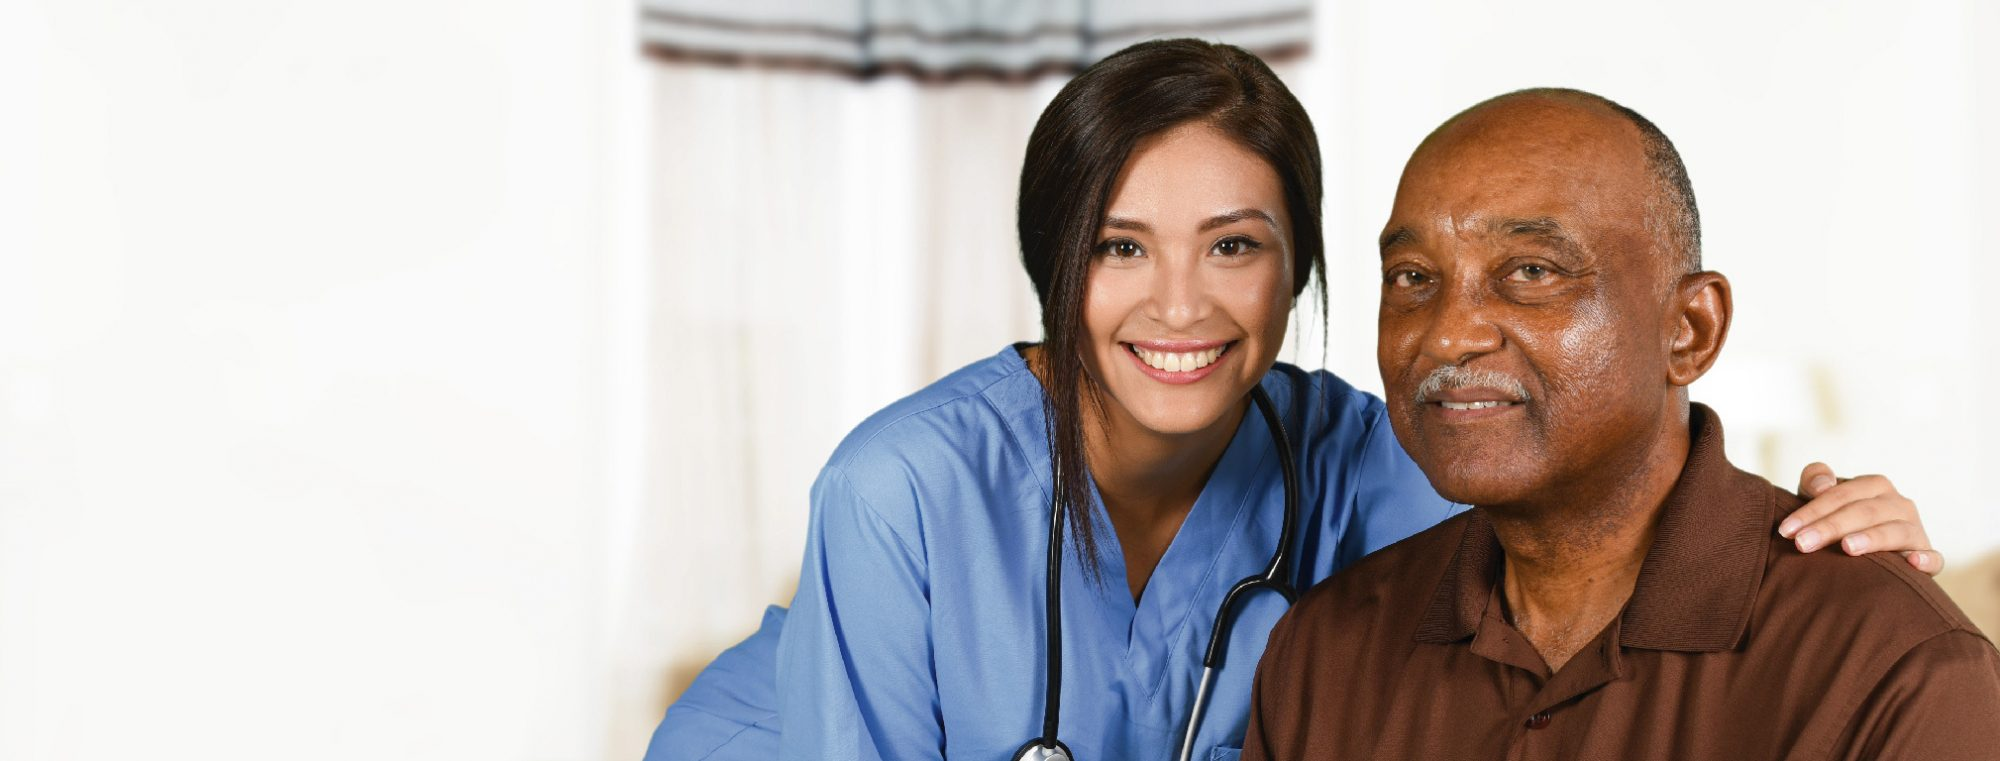 CHP Blog 60s Preventative Care Images 02